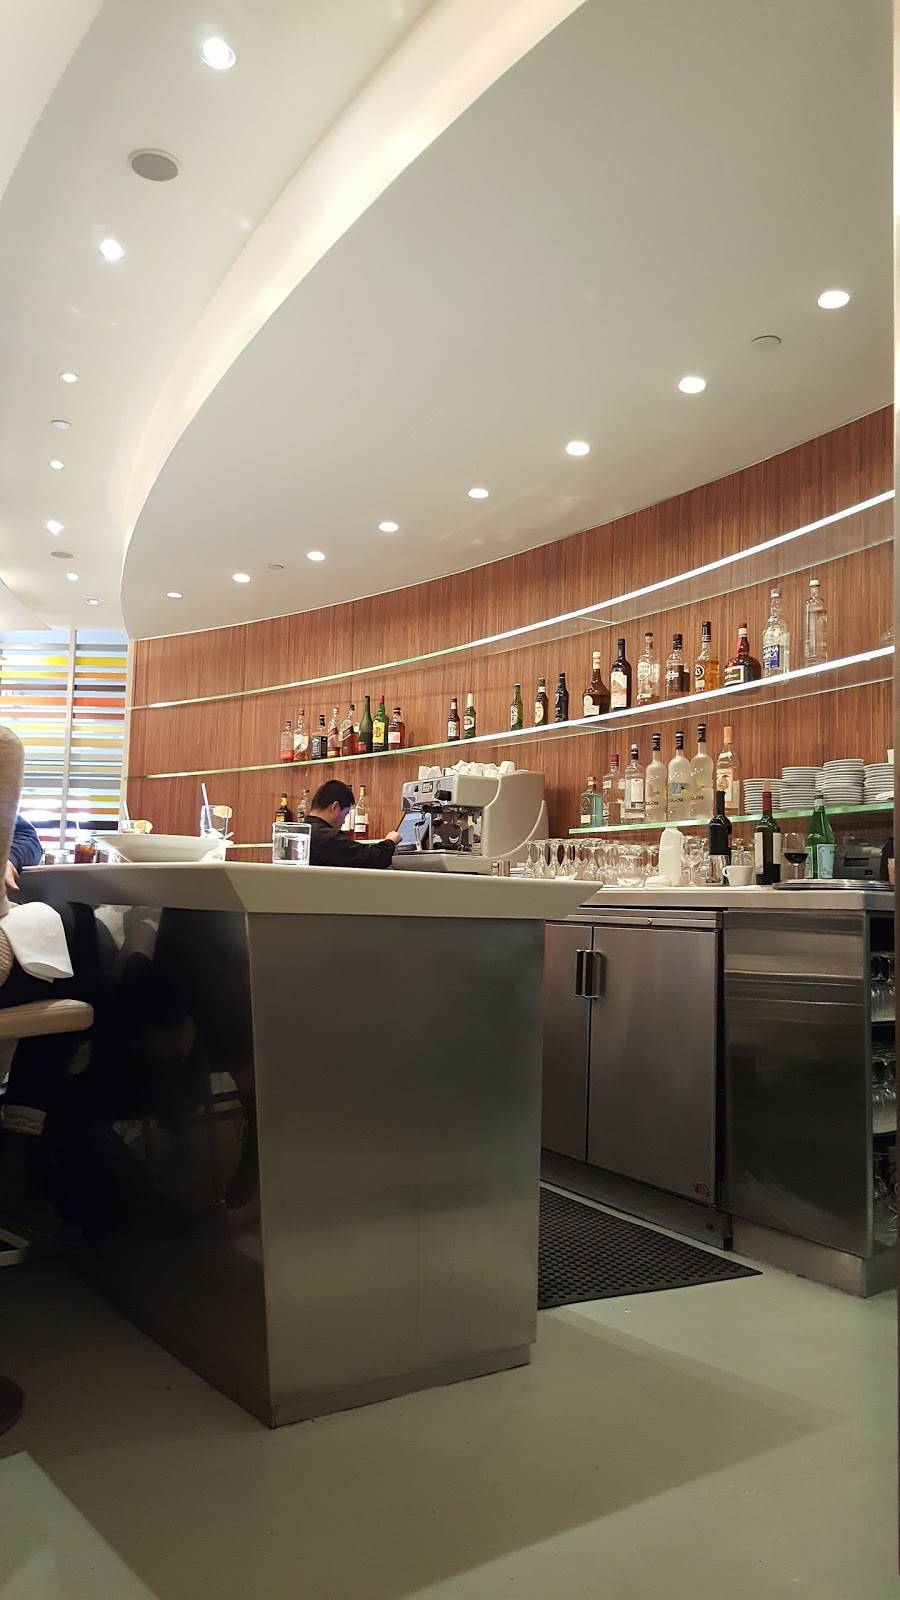 The Wright | restaurant | 1071 5th Ave, New York, NY 10128, USA | 2124275690 OR +1 212-427-5690